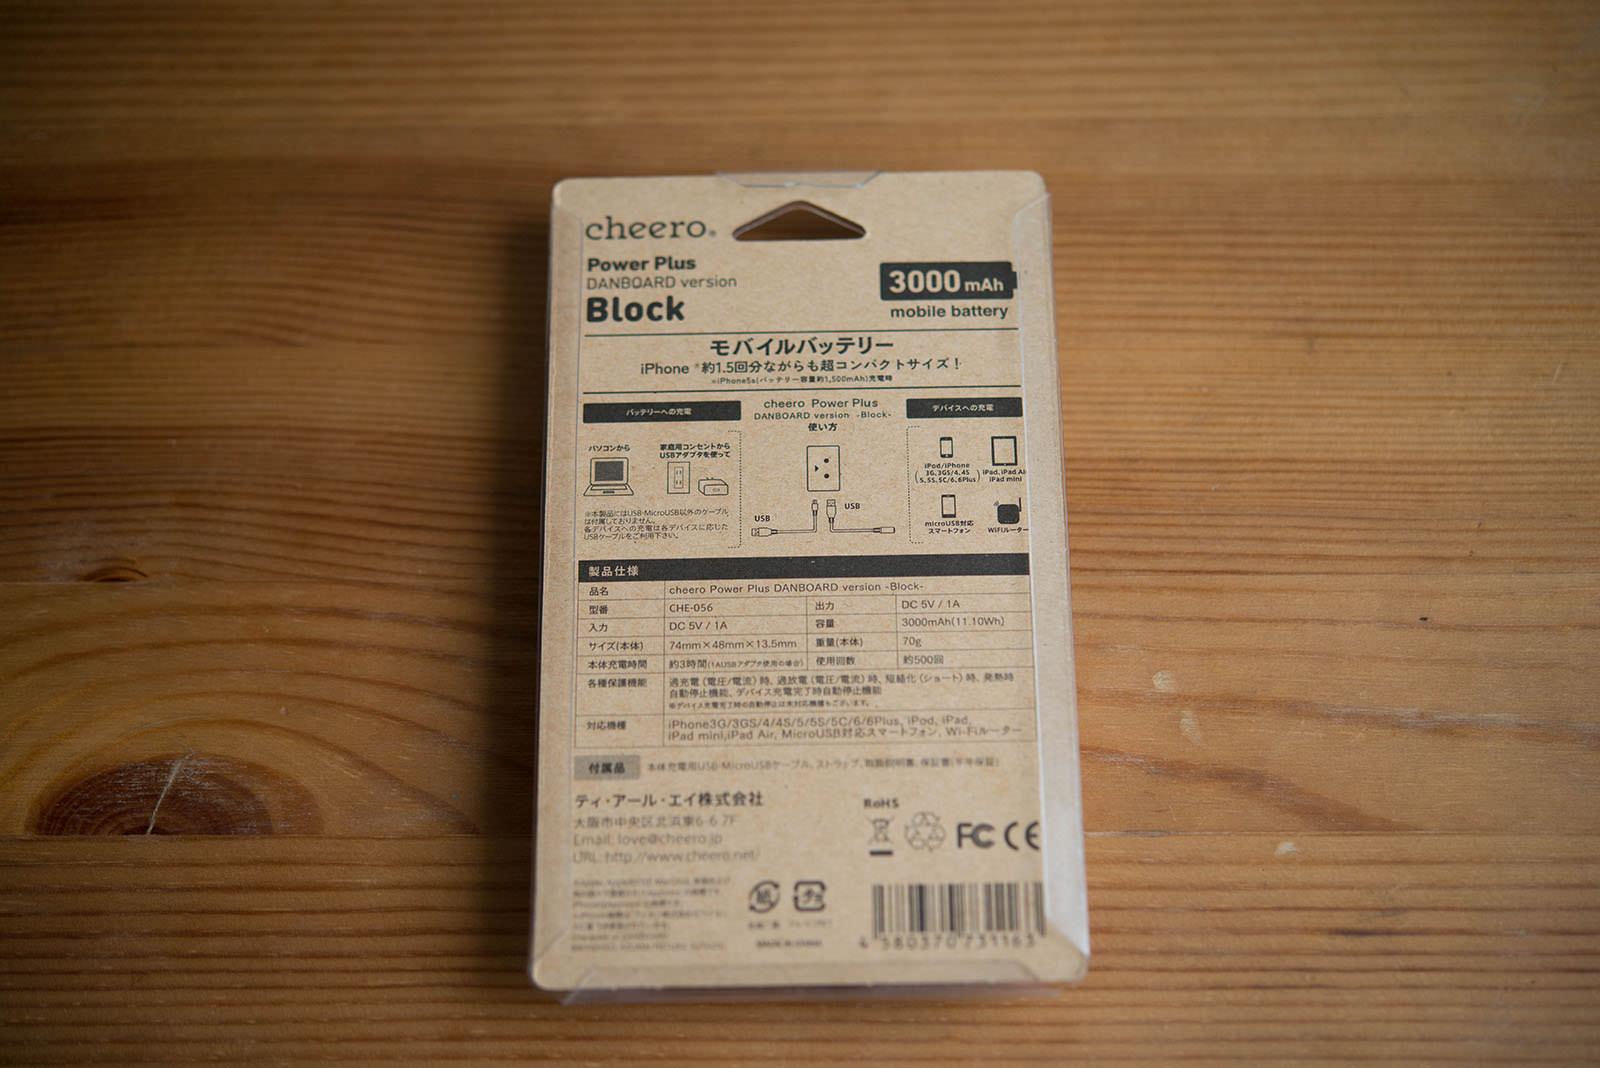 cheero Power Plus DANBOARD version block review_02